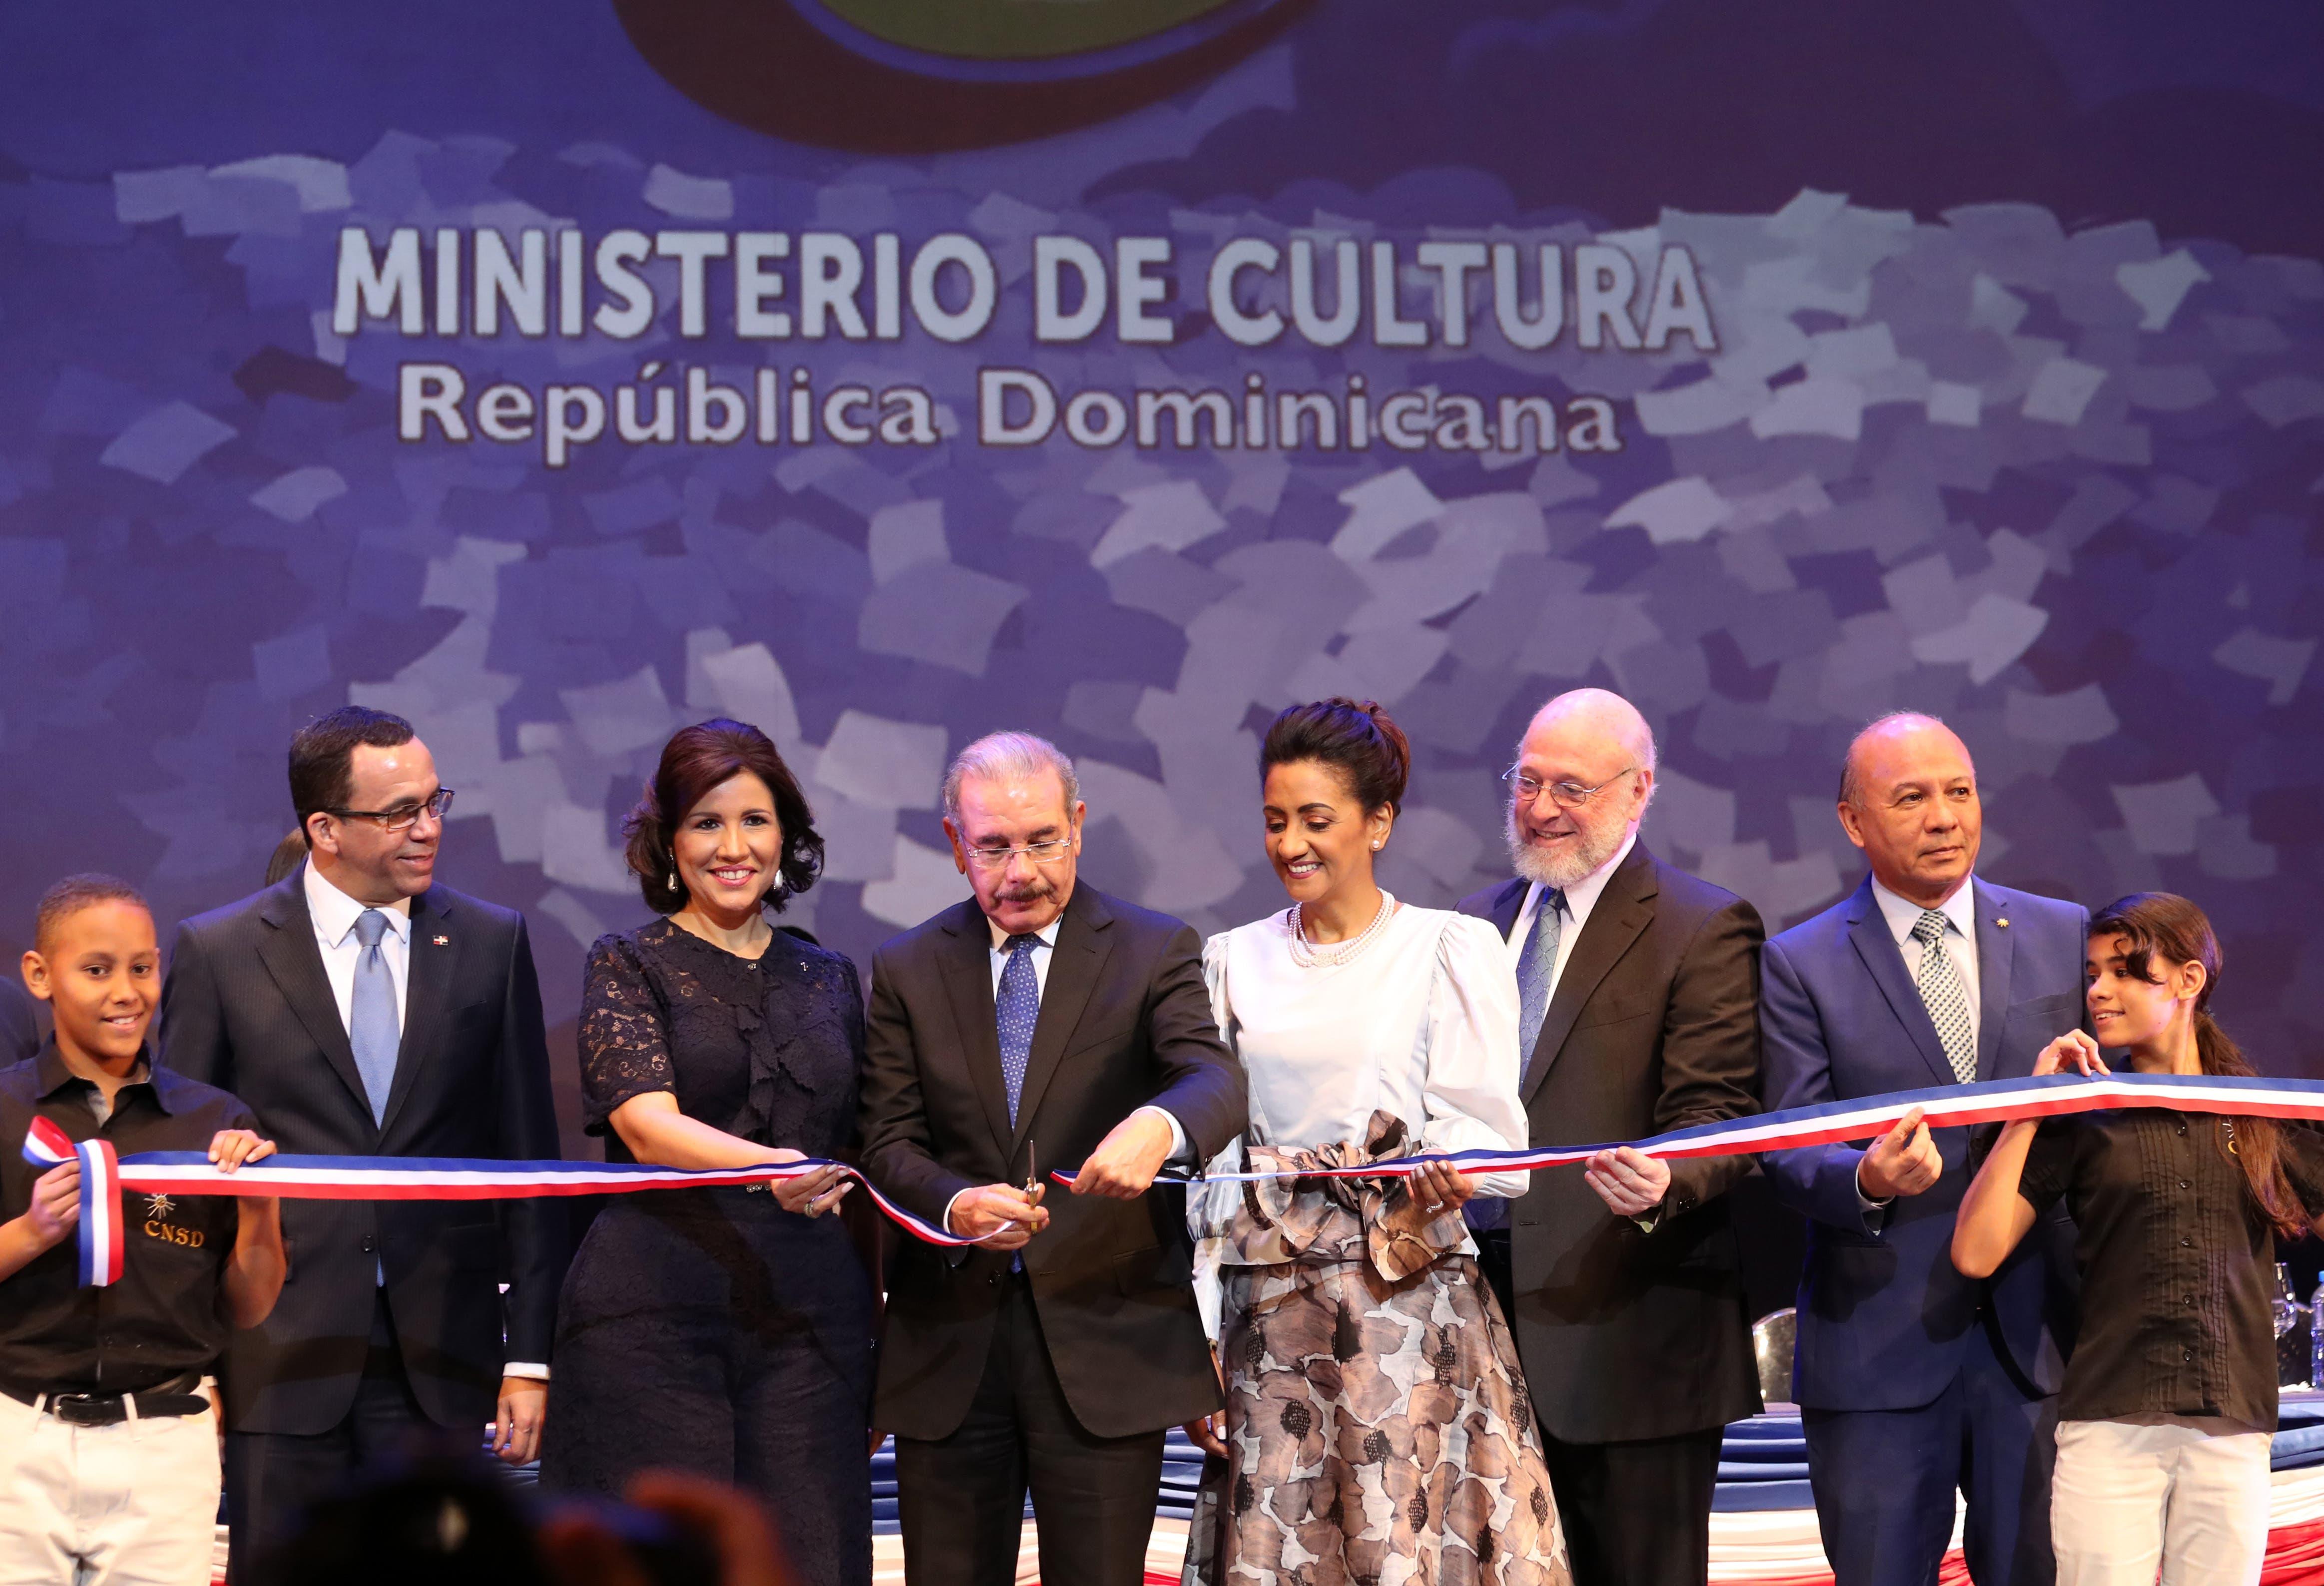 La FILSD 2018 dedica la jornada de este viernes al escritor Pedro Pablo Fernández